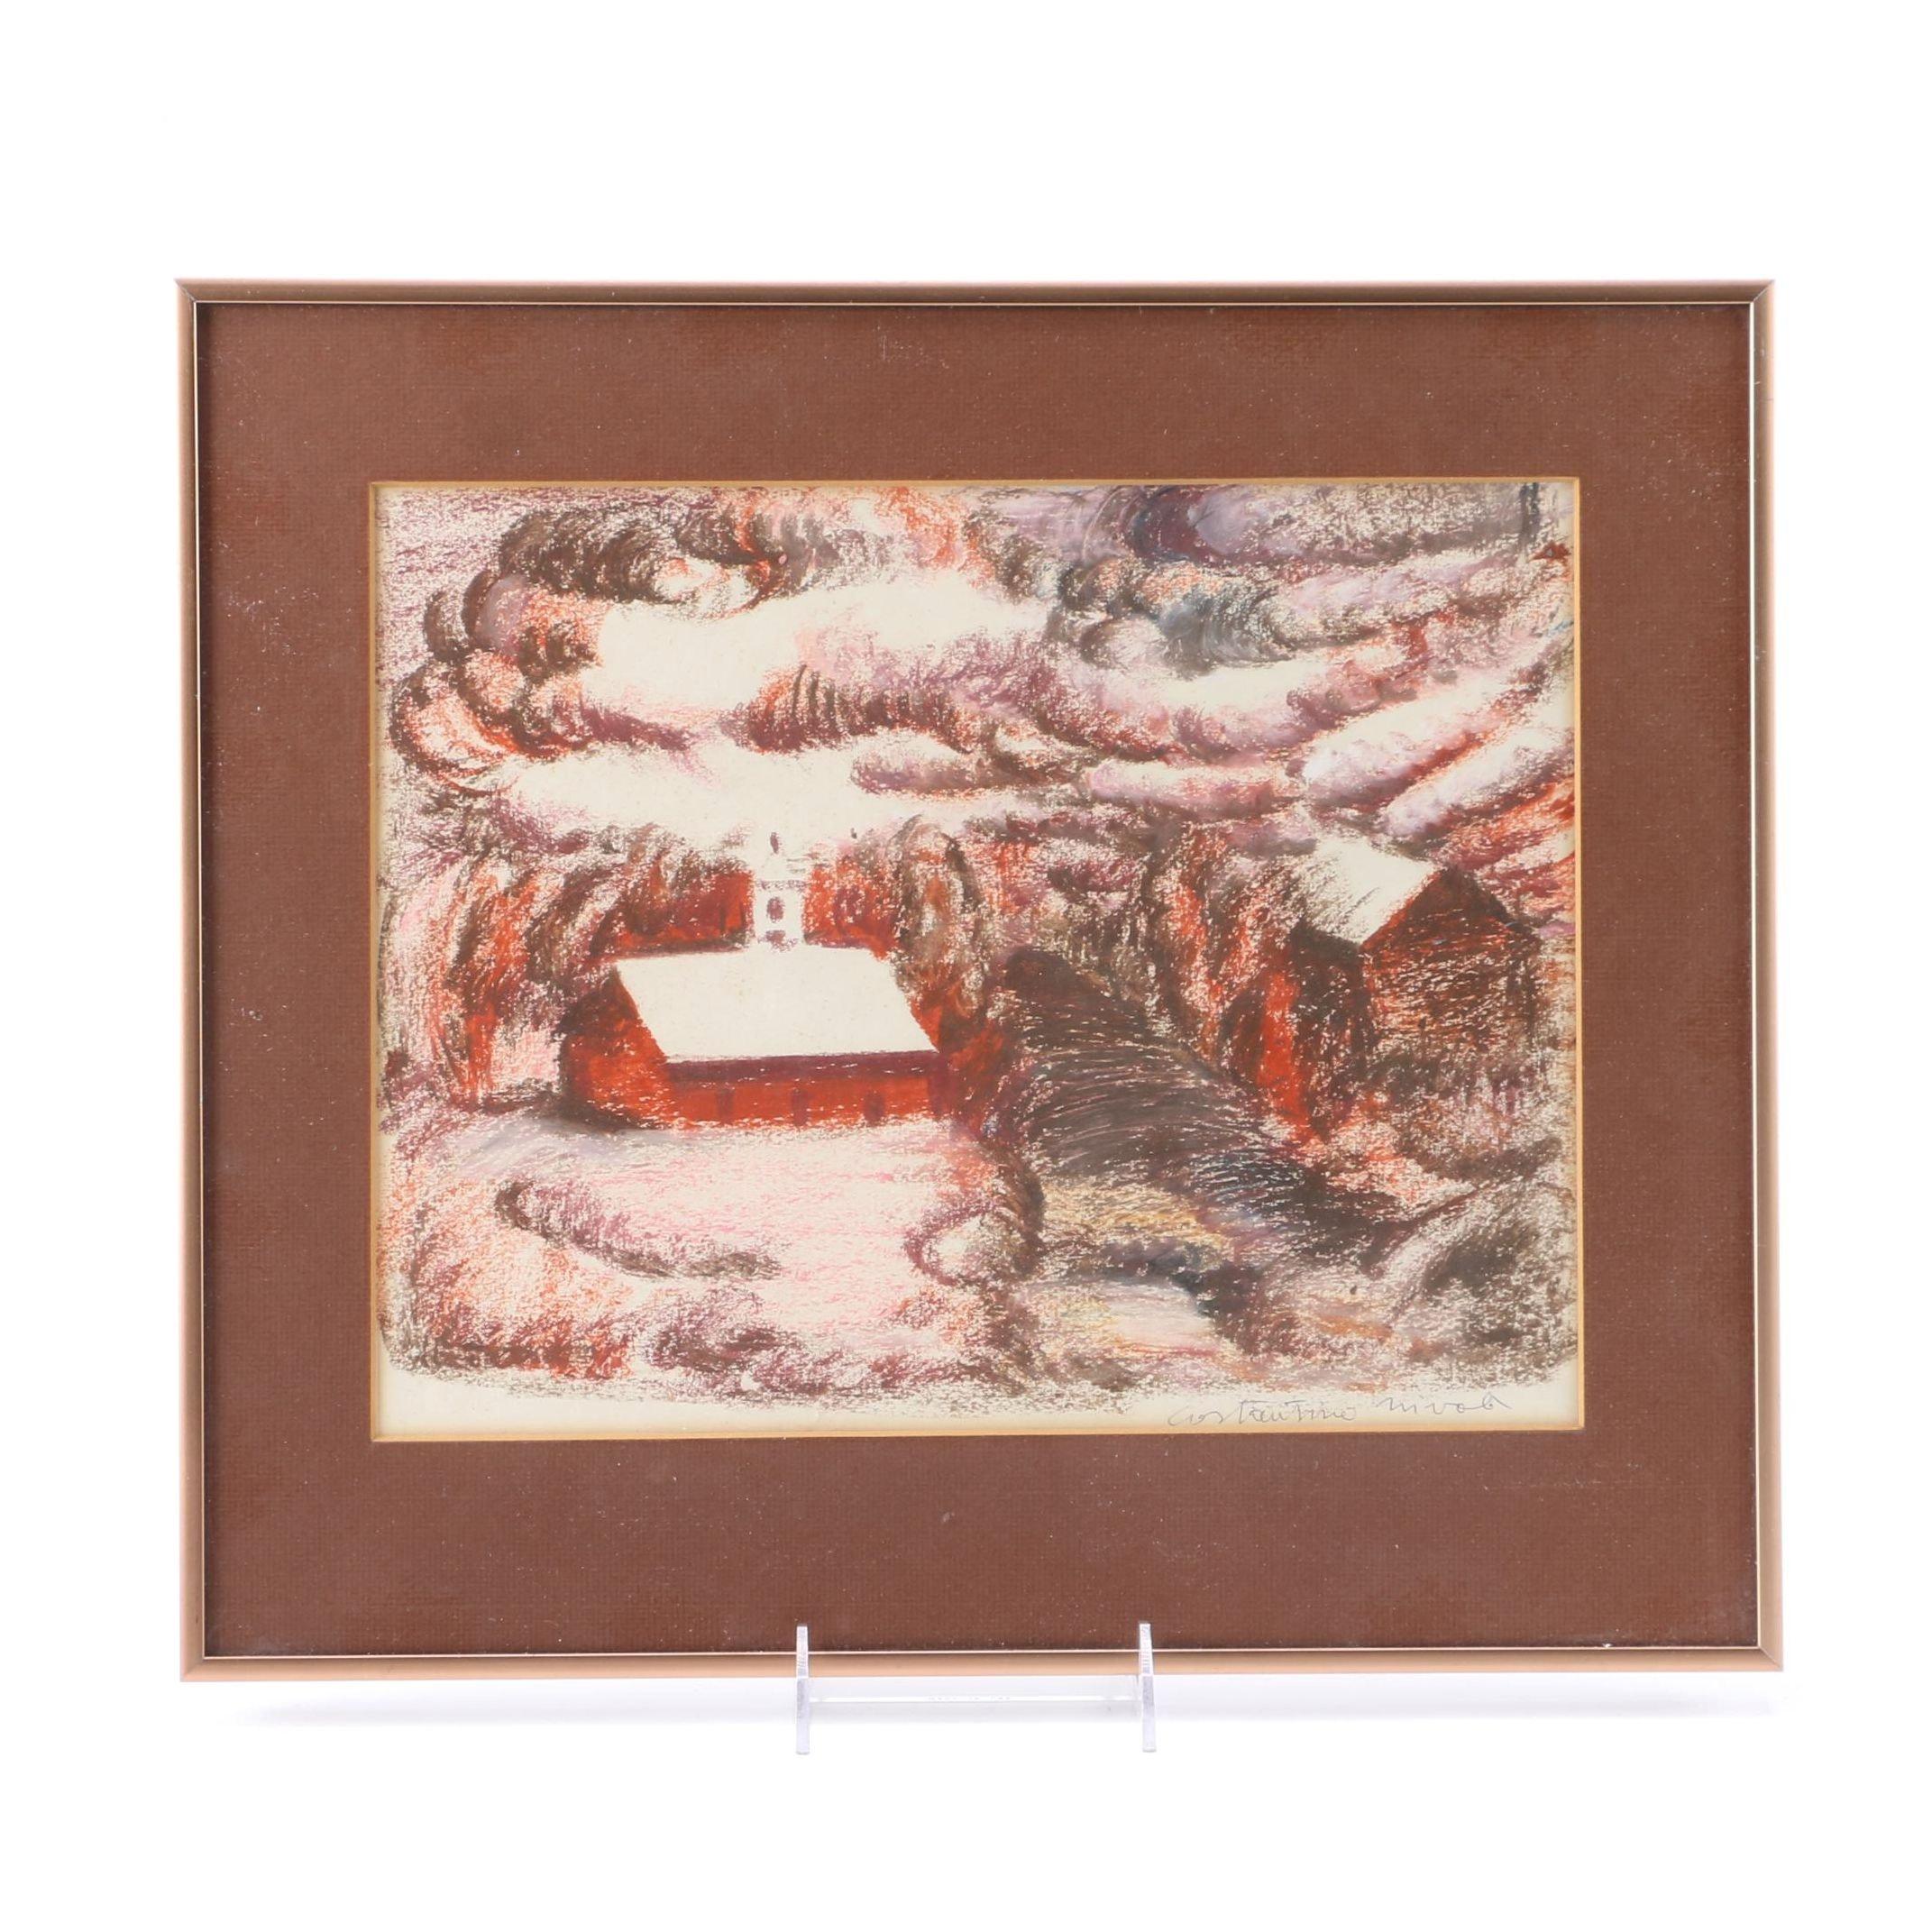 Costantino Nivola Conte Crayon Drawing of Autumn Landscape